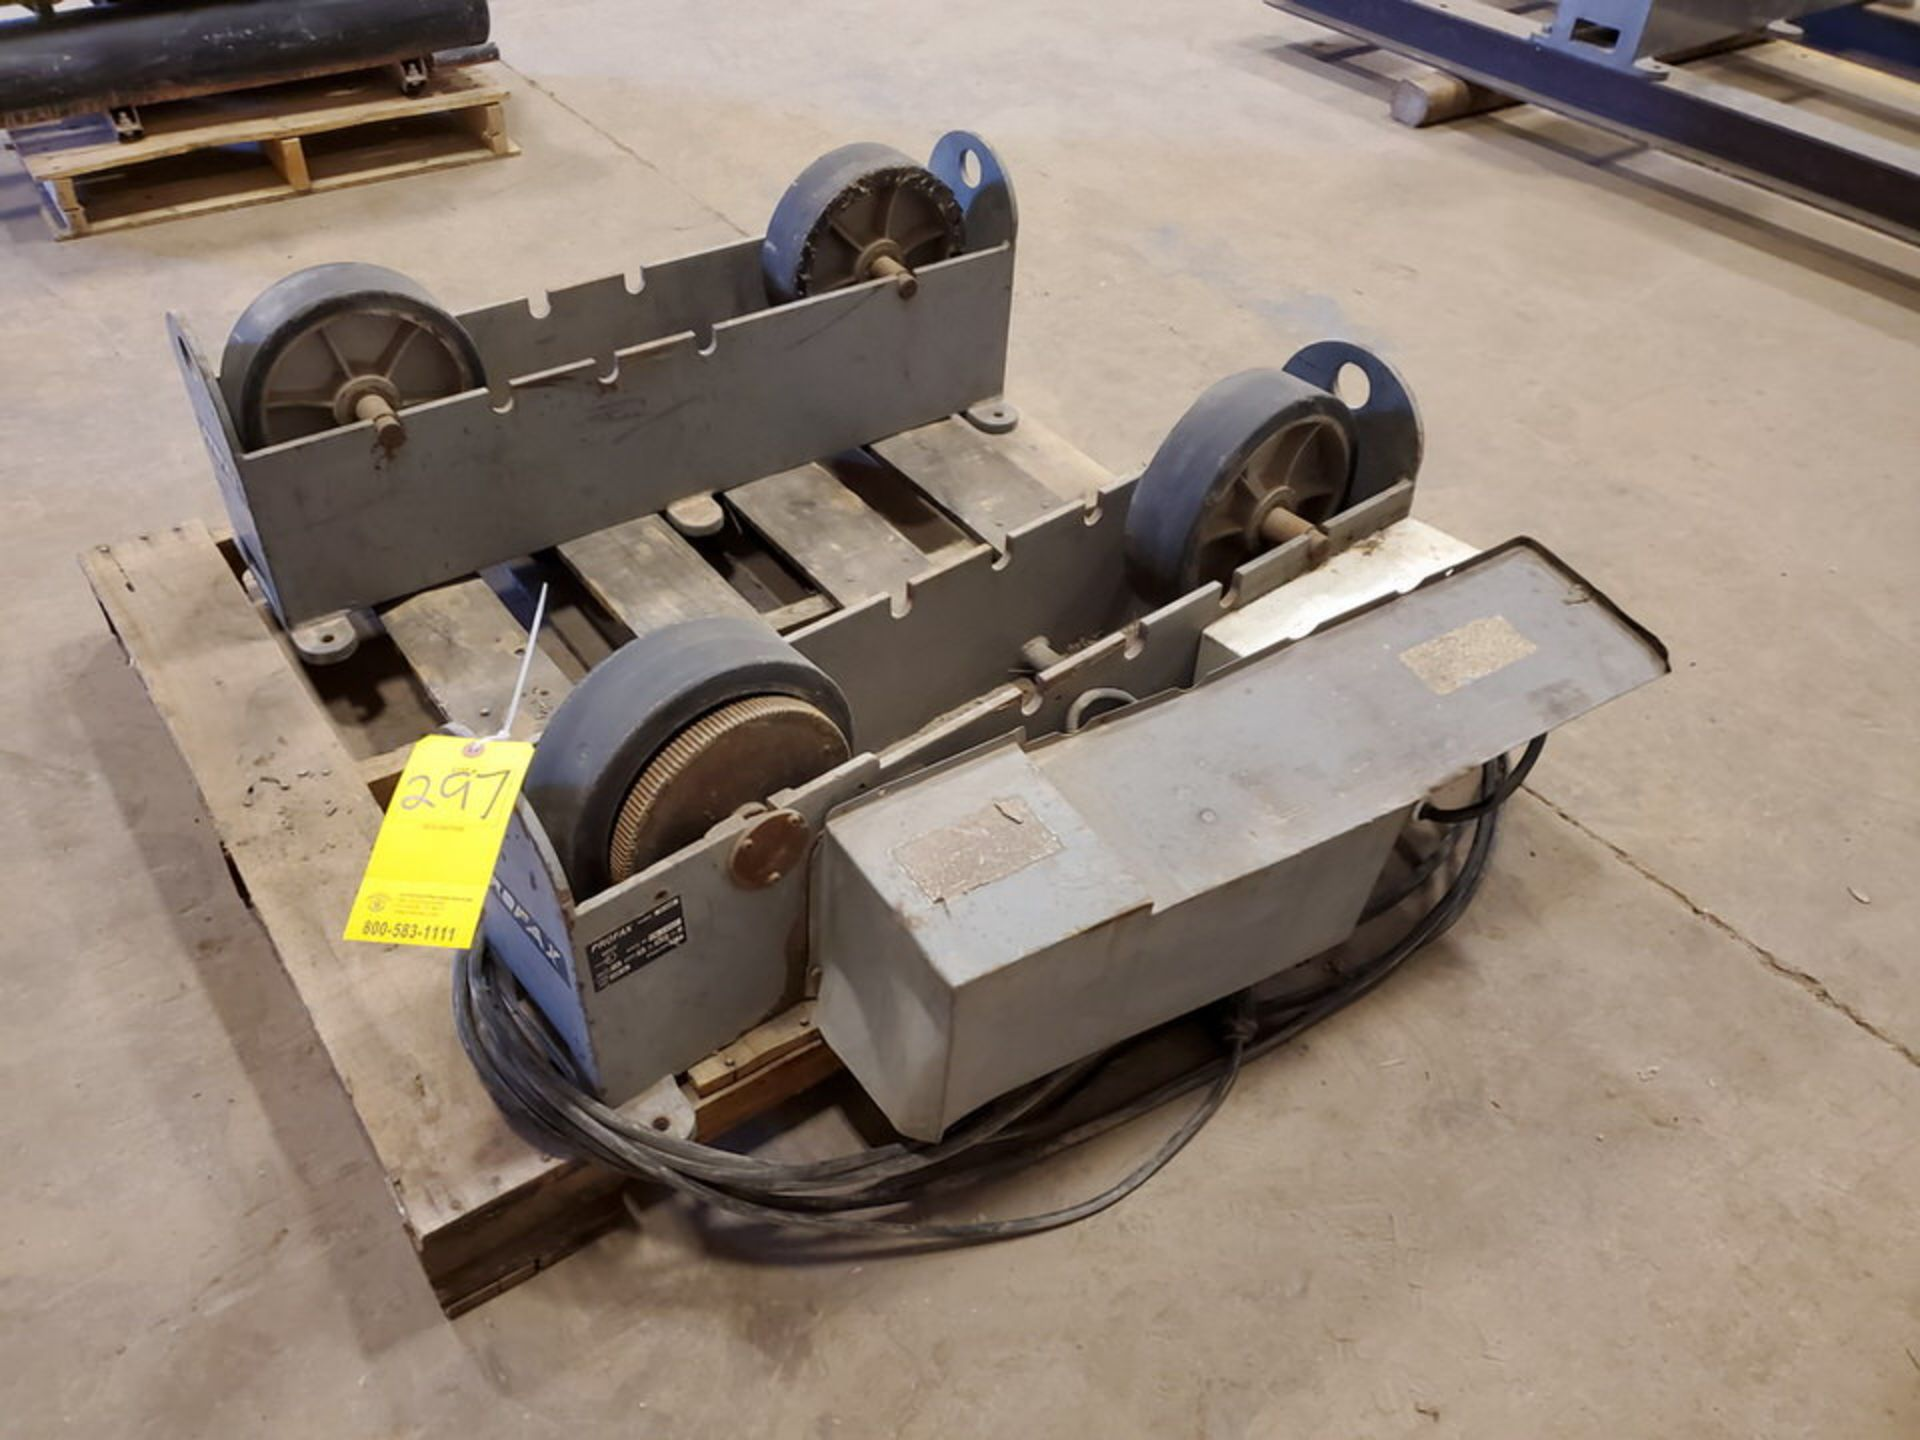 "Profax TR-5000 Turn Roll 5K Cap., 115V, 10A, 50/60HZ, 1PH, RPM: 0-5; 3"" Wheel Dia."